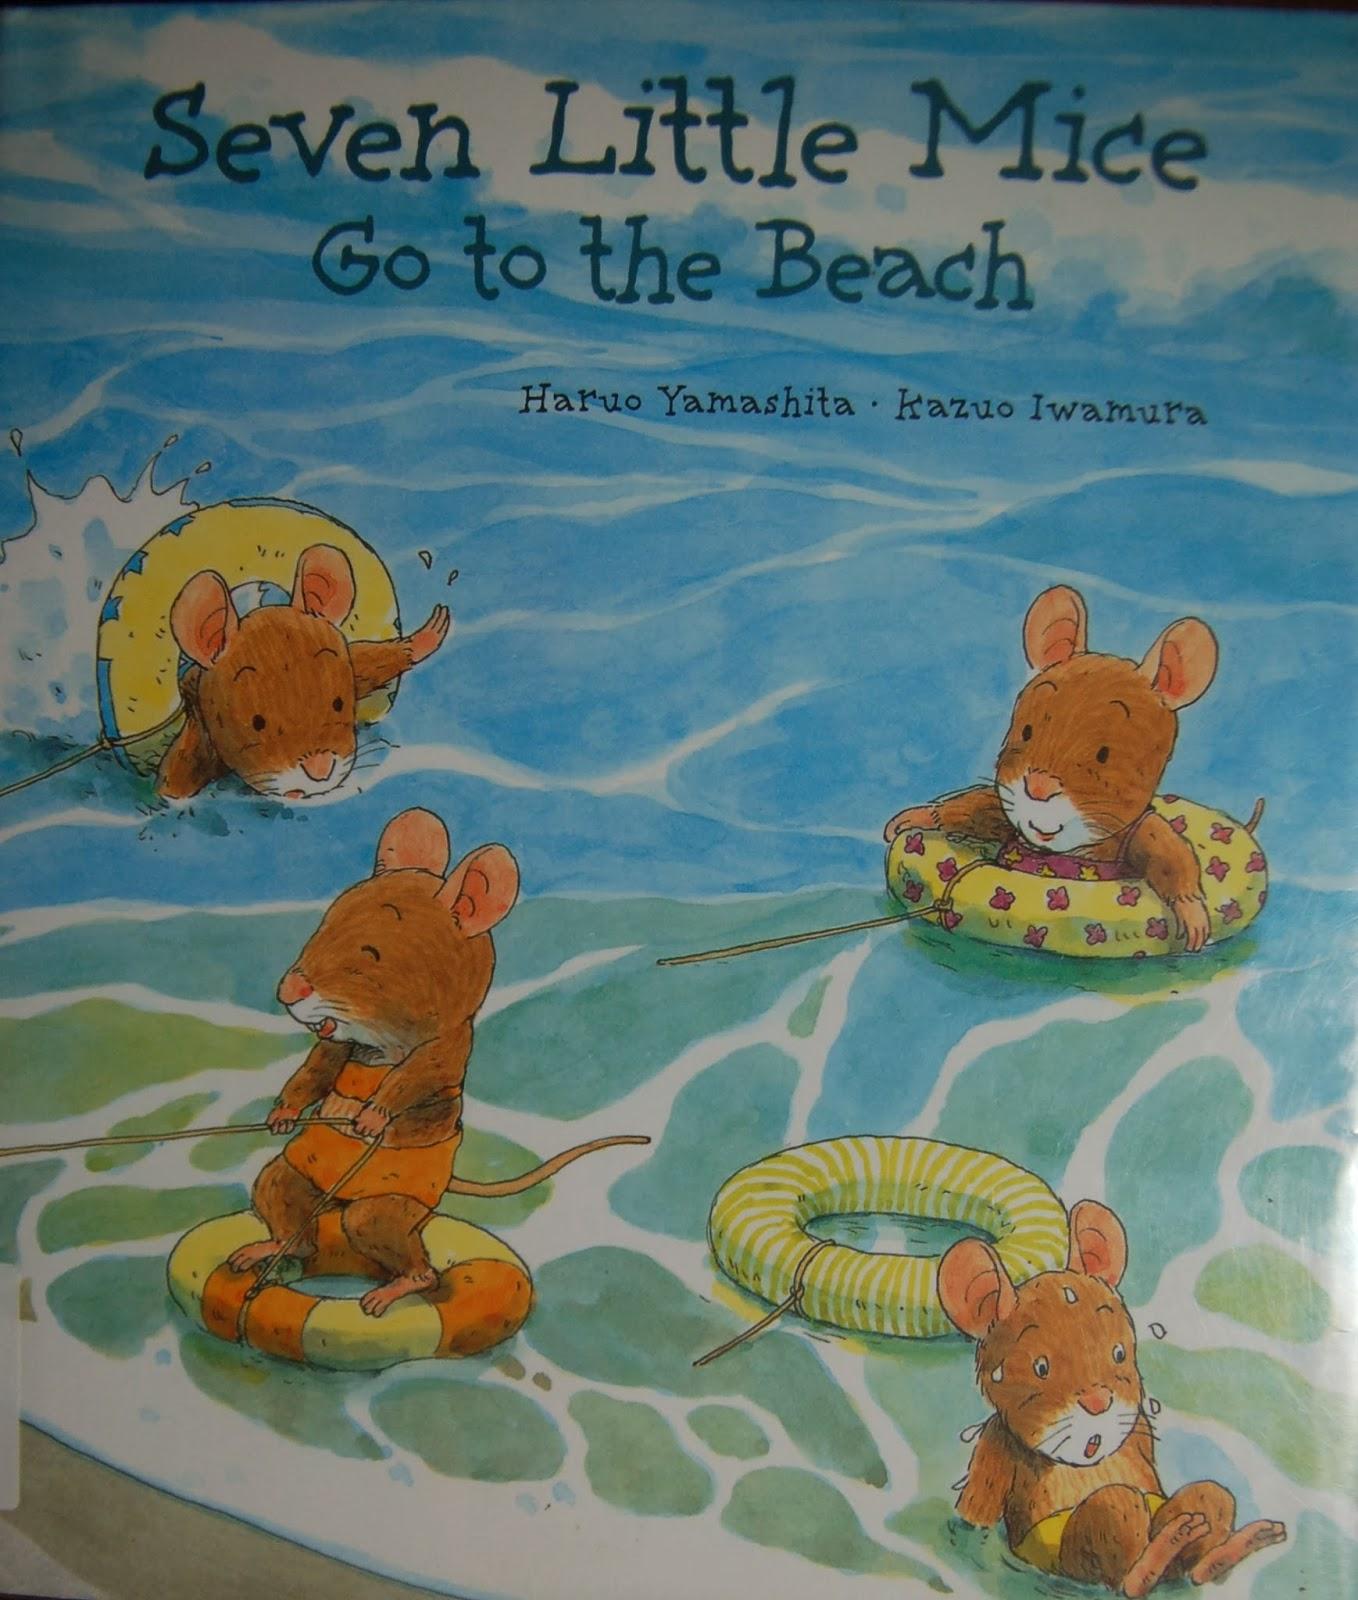 Seven little mice go to the beach. 此照片翻拍自圖書館書籍